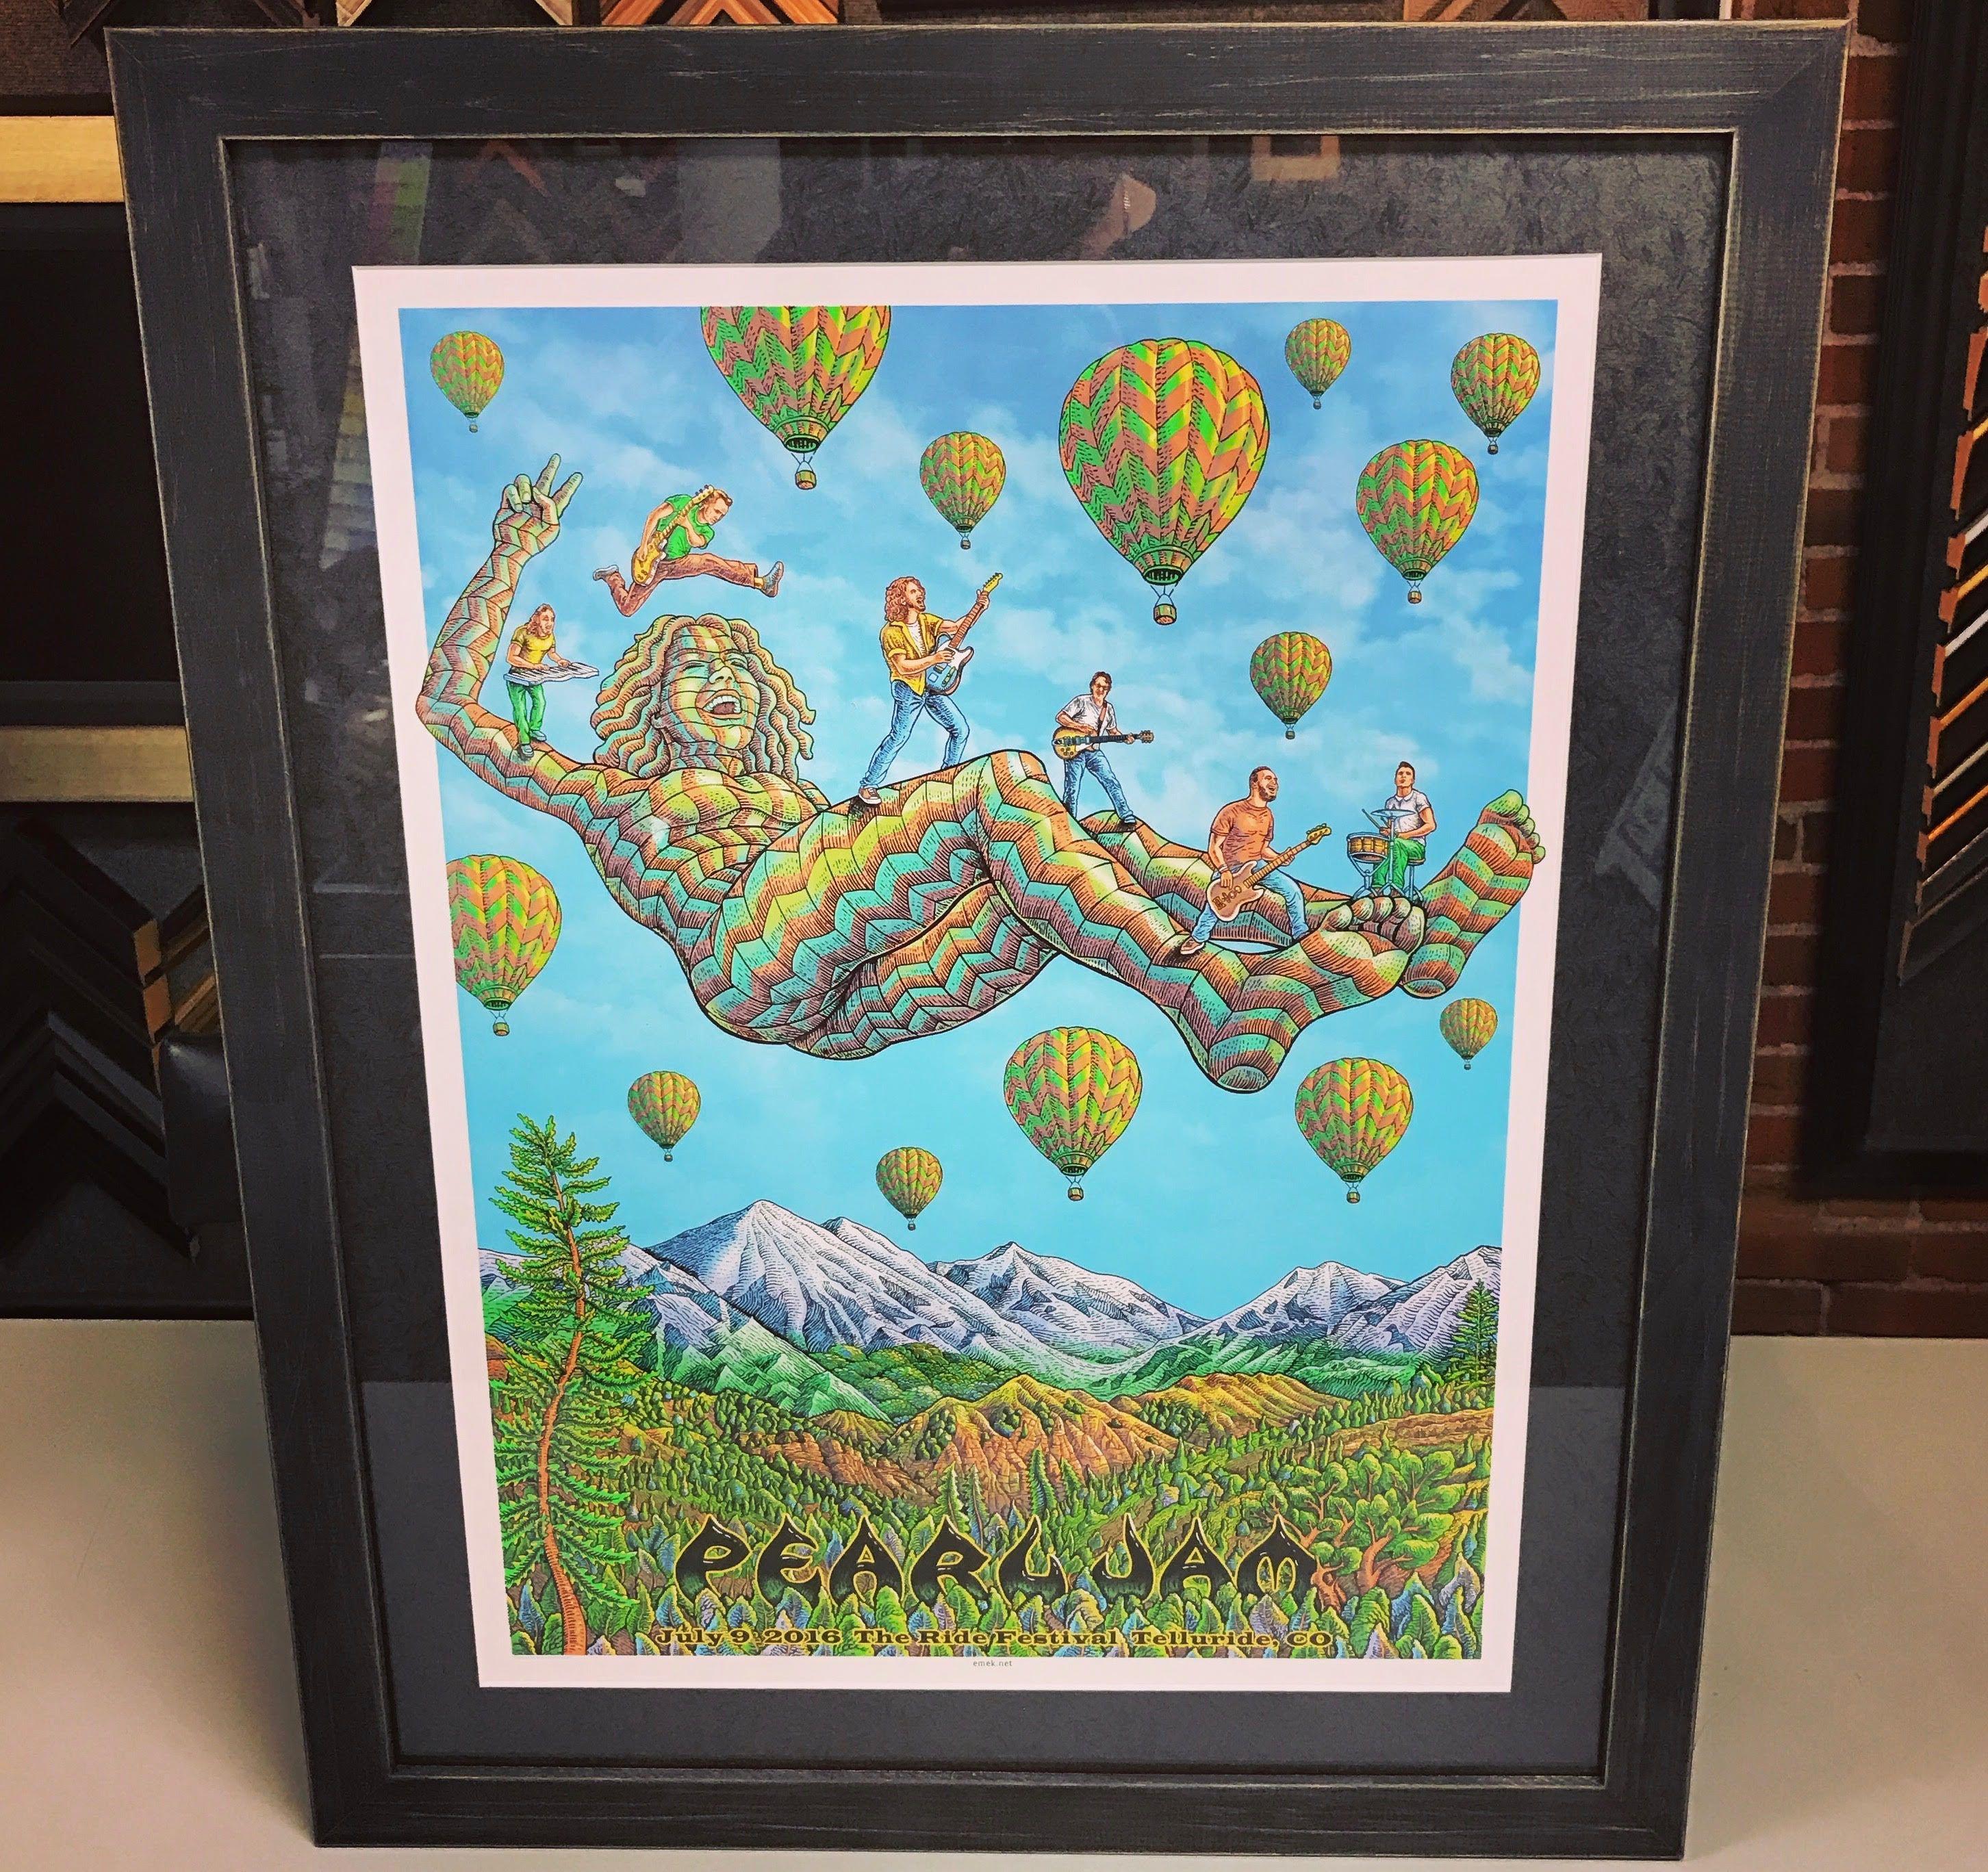 Custom Framed Pearl Jam Print Using A Textured Metallic Mat Uv